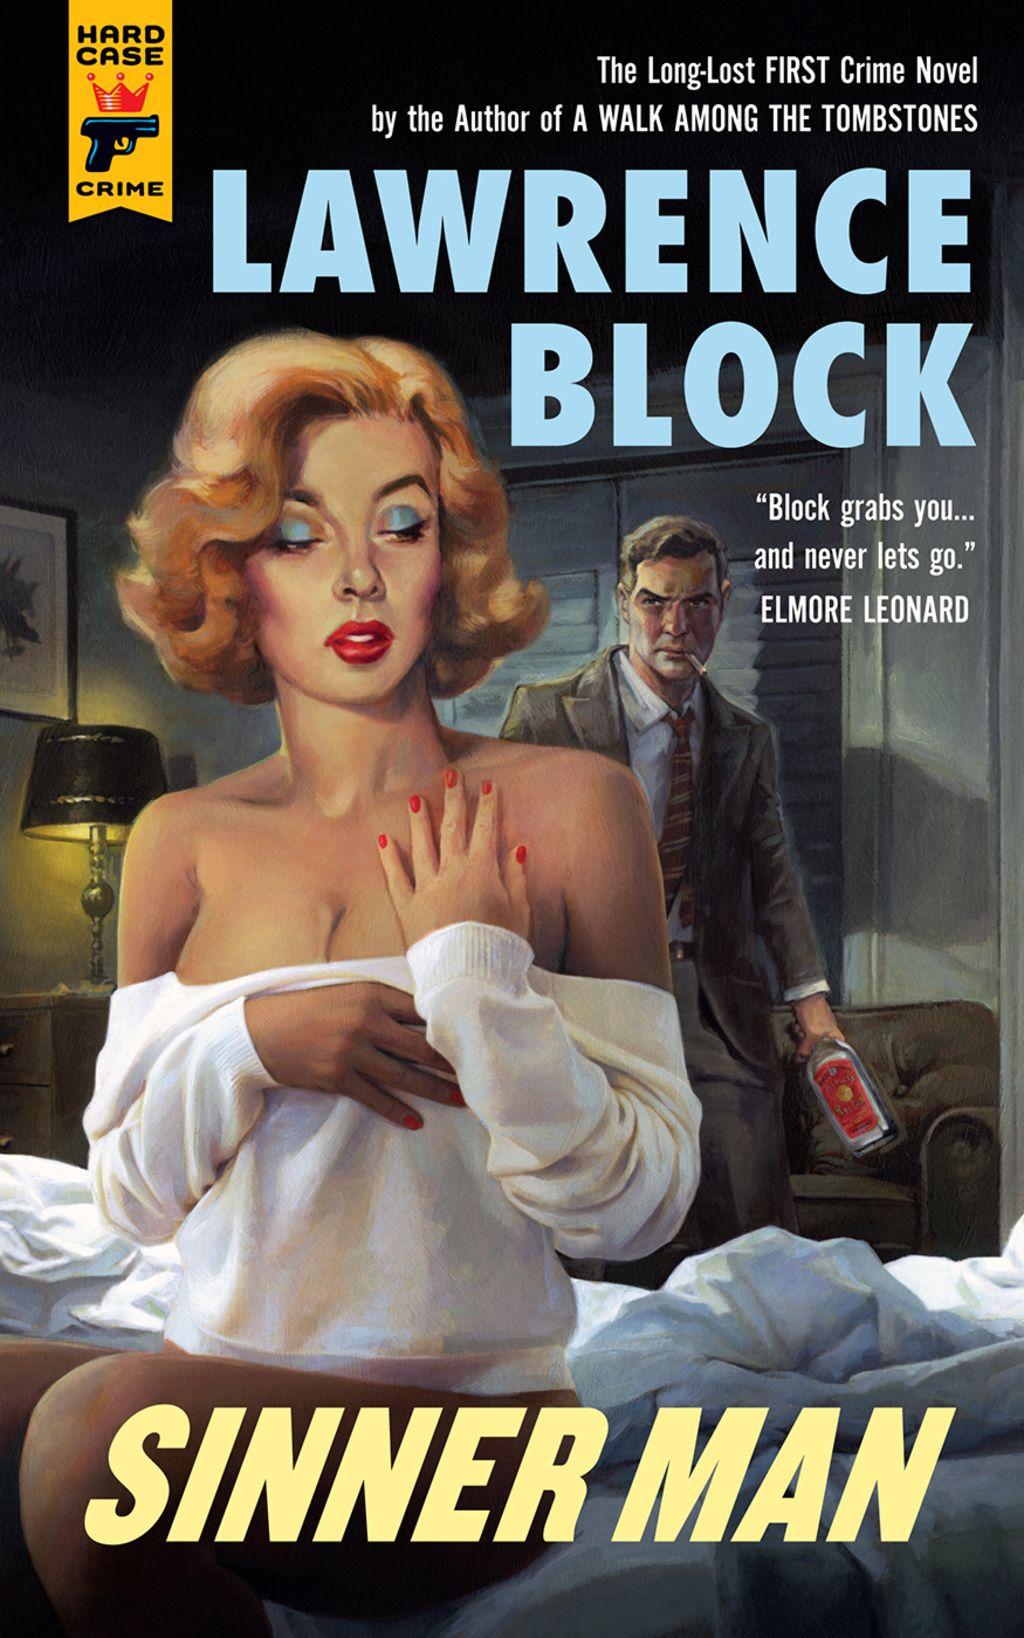 Sinner Man (eBook) Lawrence block, Pulp fiction book